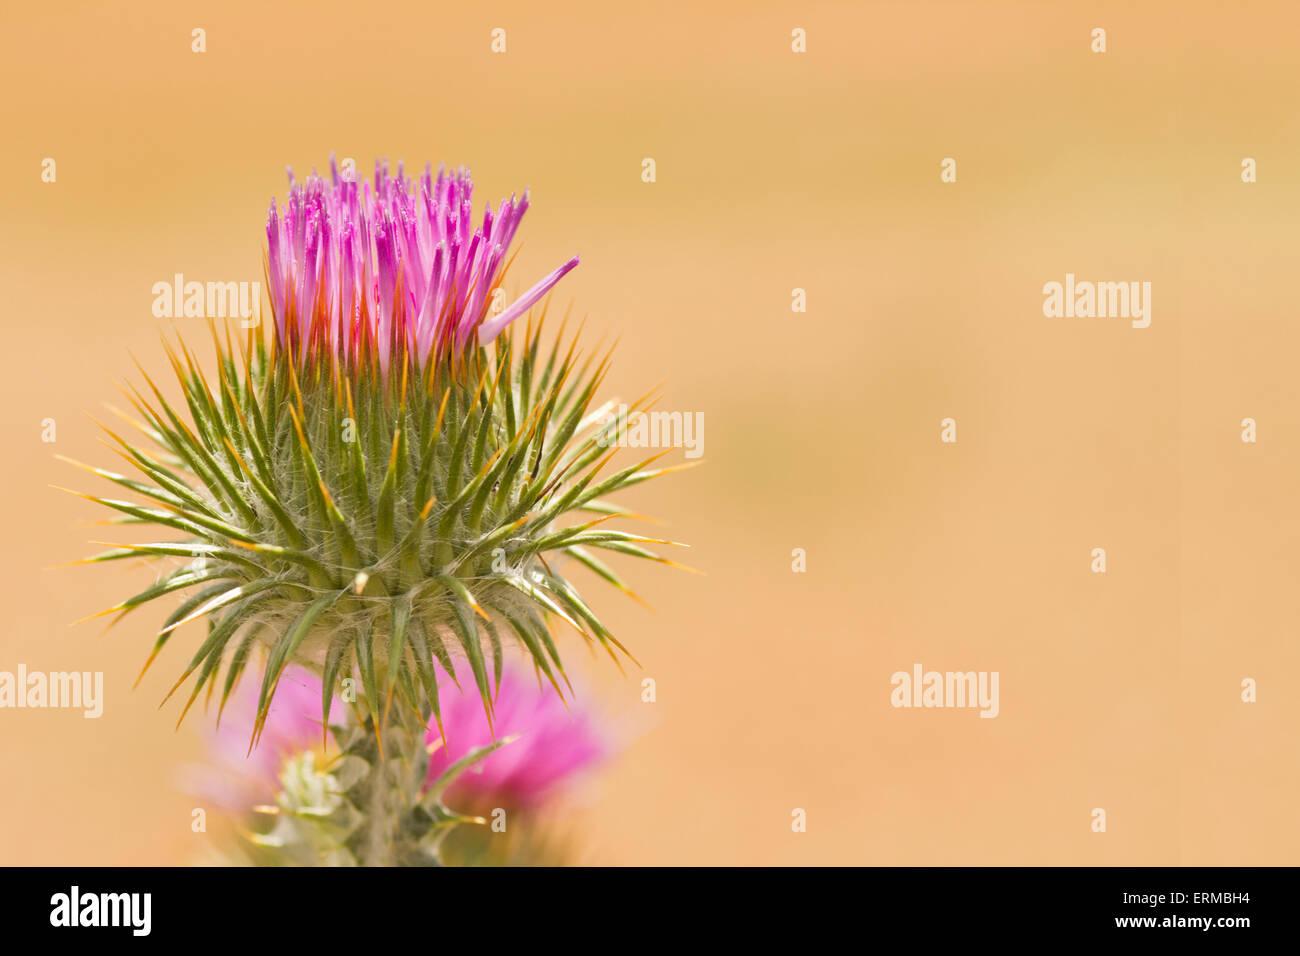 Purple thistle on sand background - Stock Image